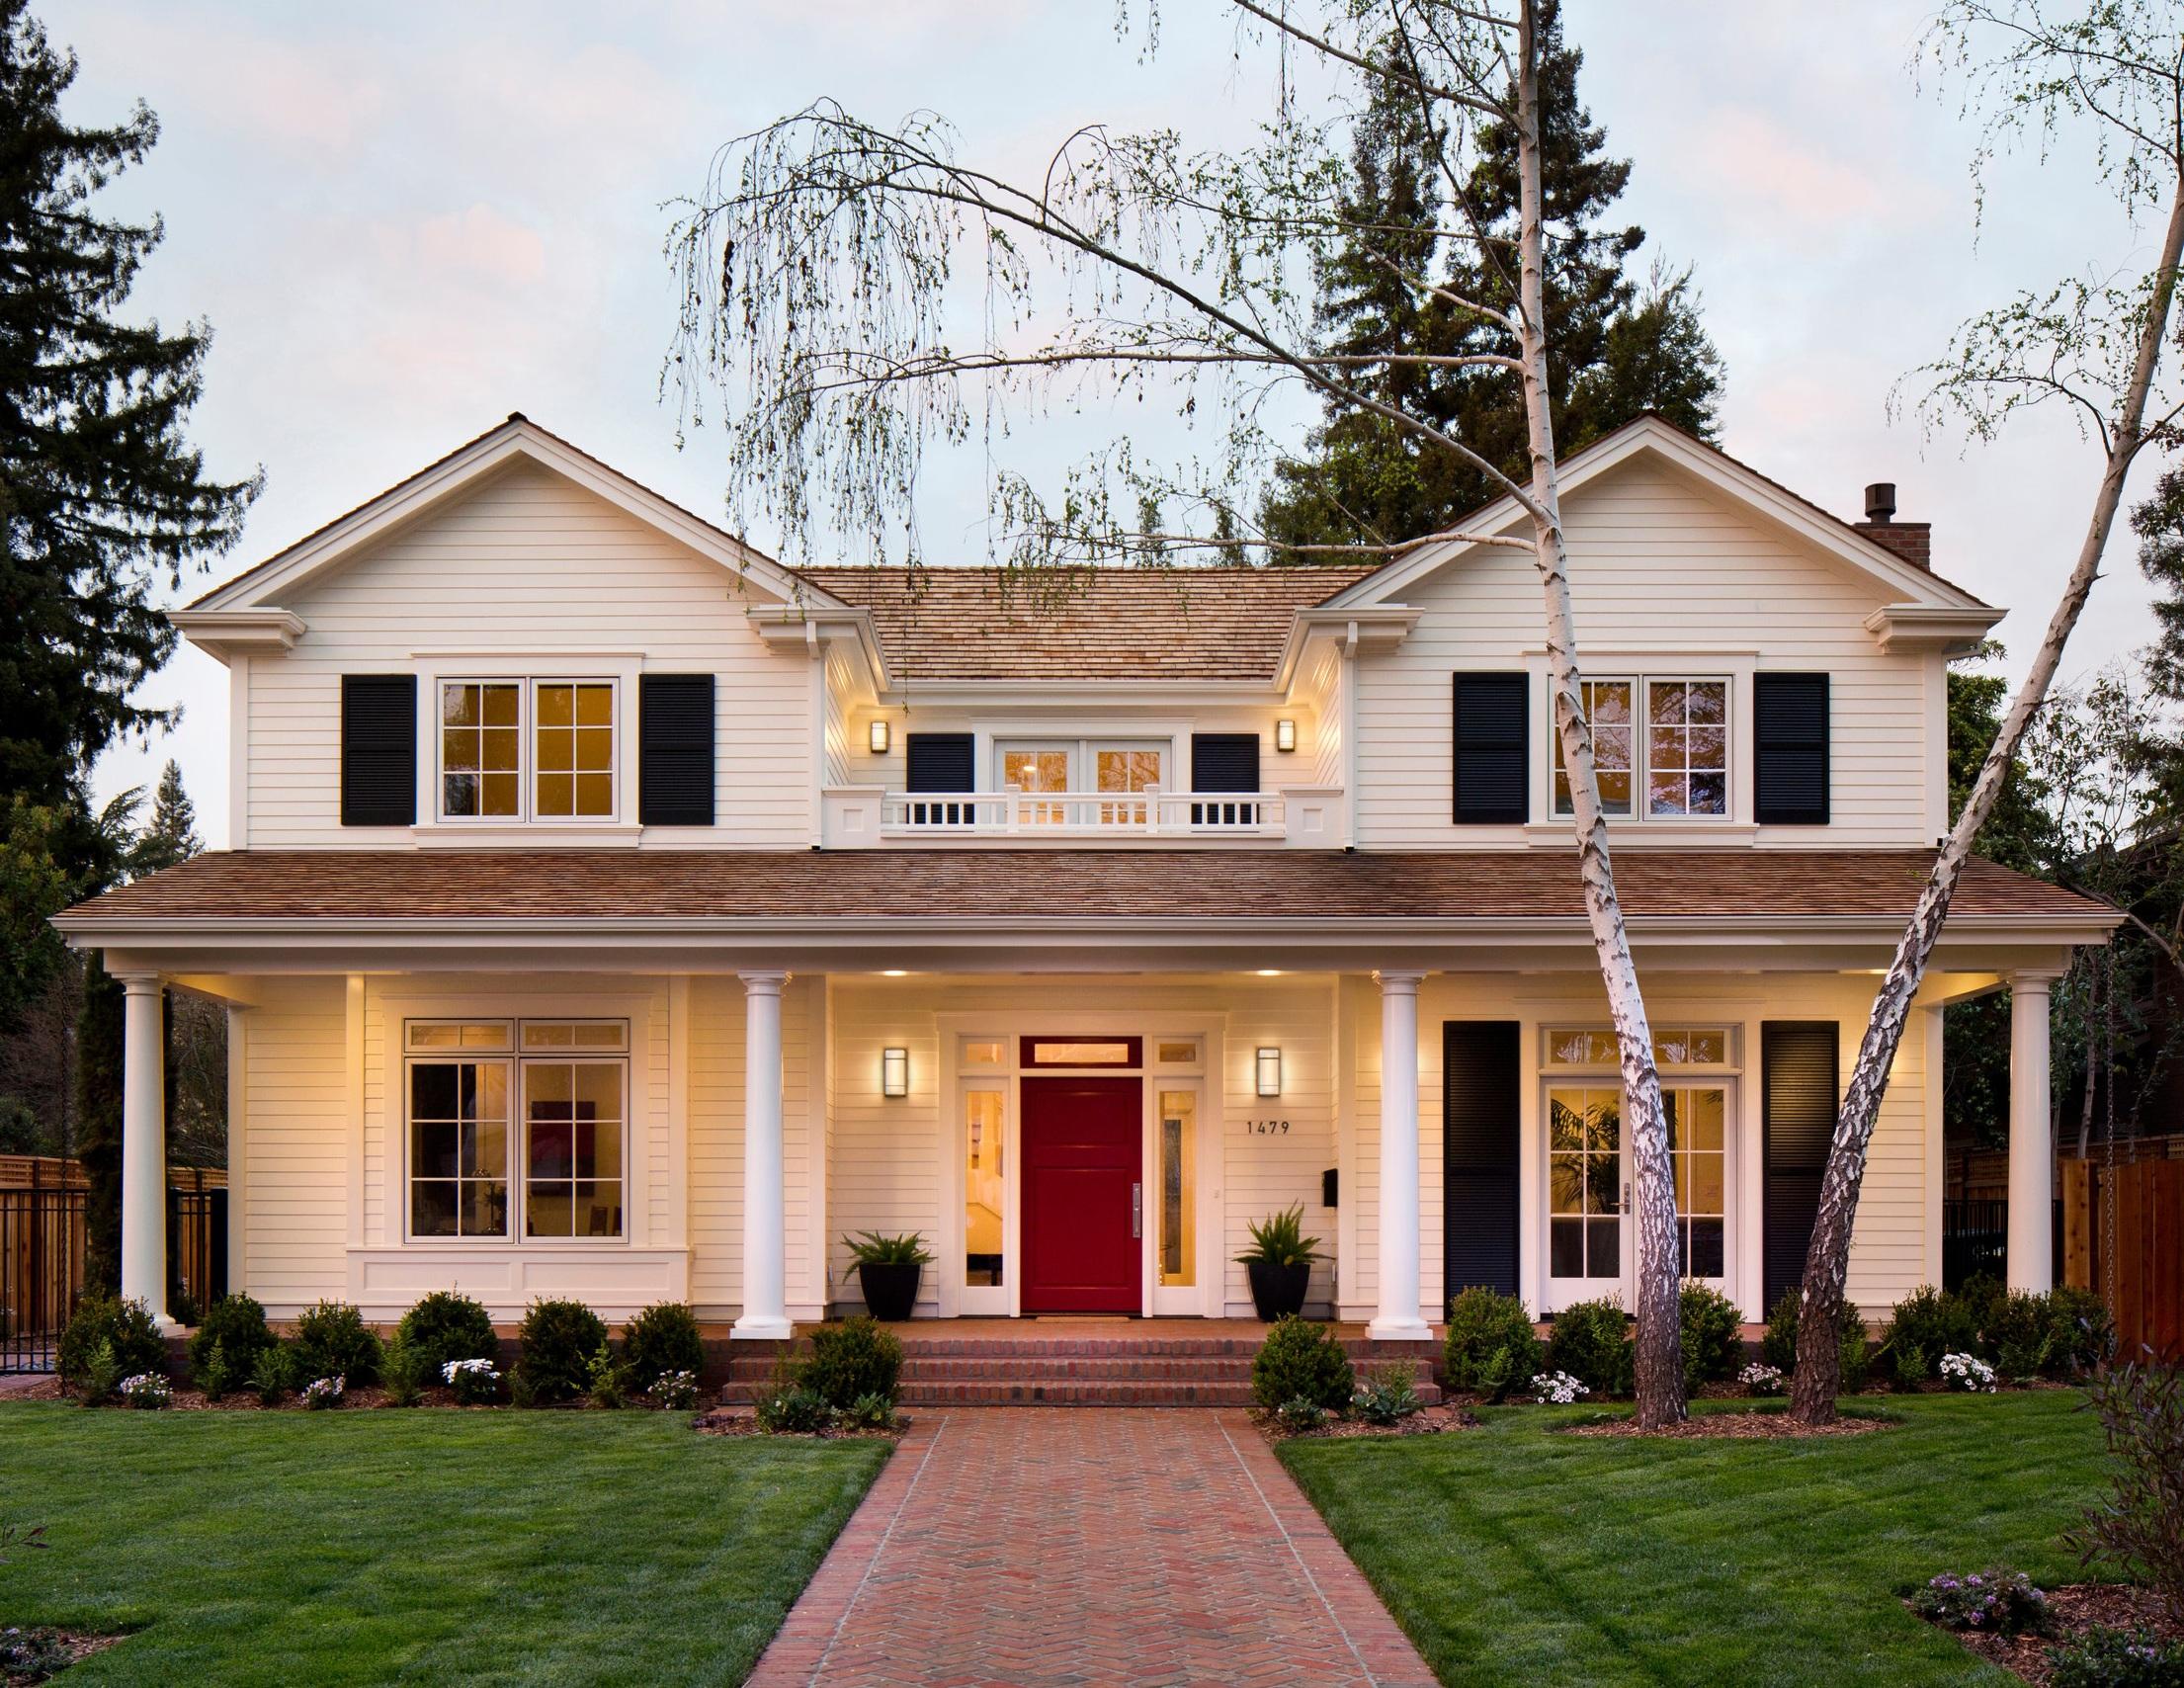 $9,450,000 | 1479 Hamilton Ave., Palo Alto